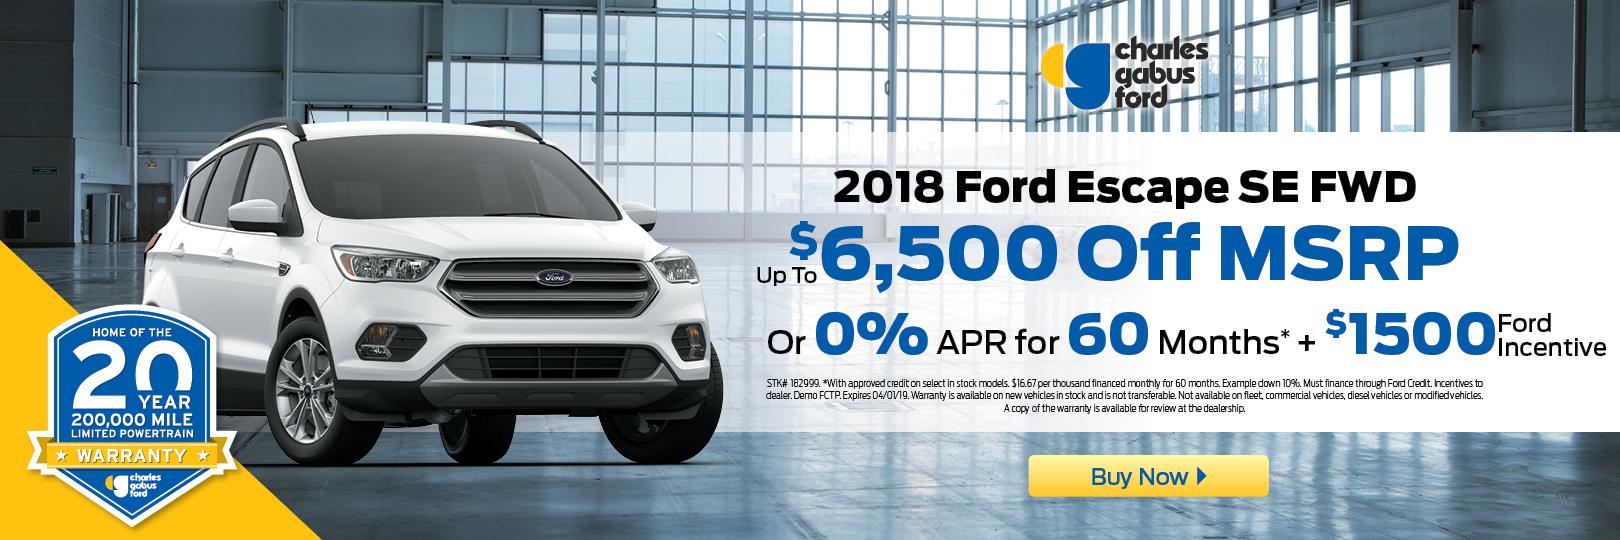 Charles Gabus Ford >> Ford Dealer Des Moines, IA | Charles Gabus Ford